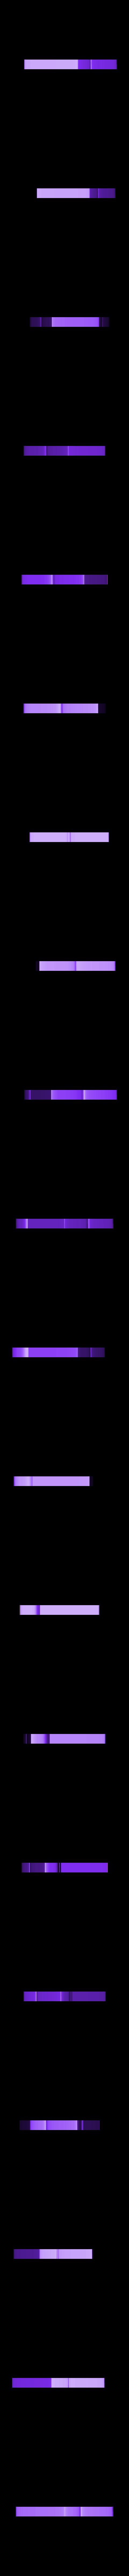 triangle.stl Download free STL file Optical Illusion Shapes 2D • Design to 3D print, UnpredictableLab